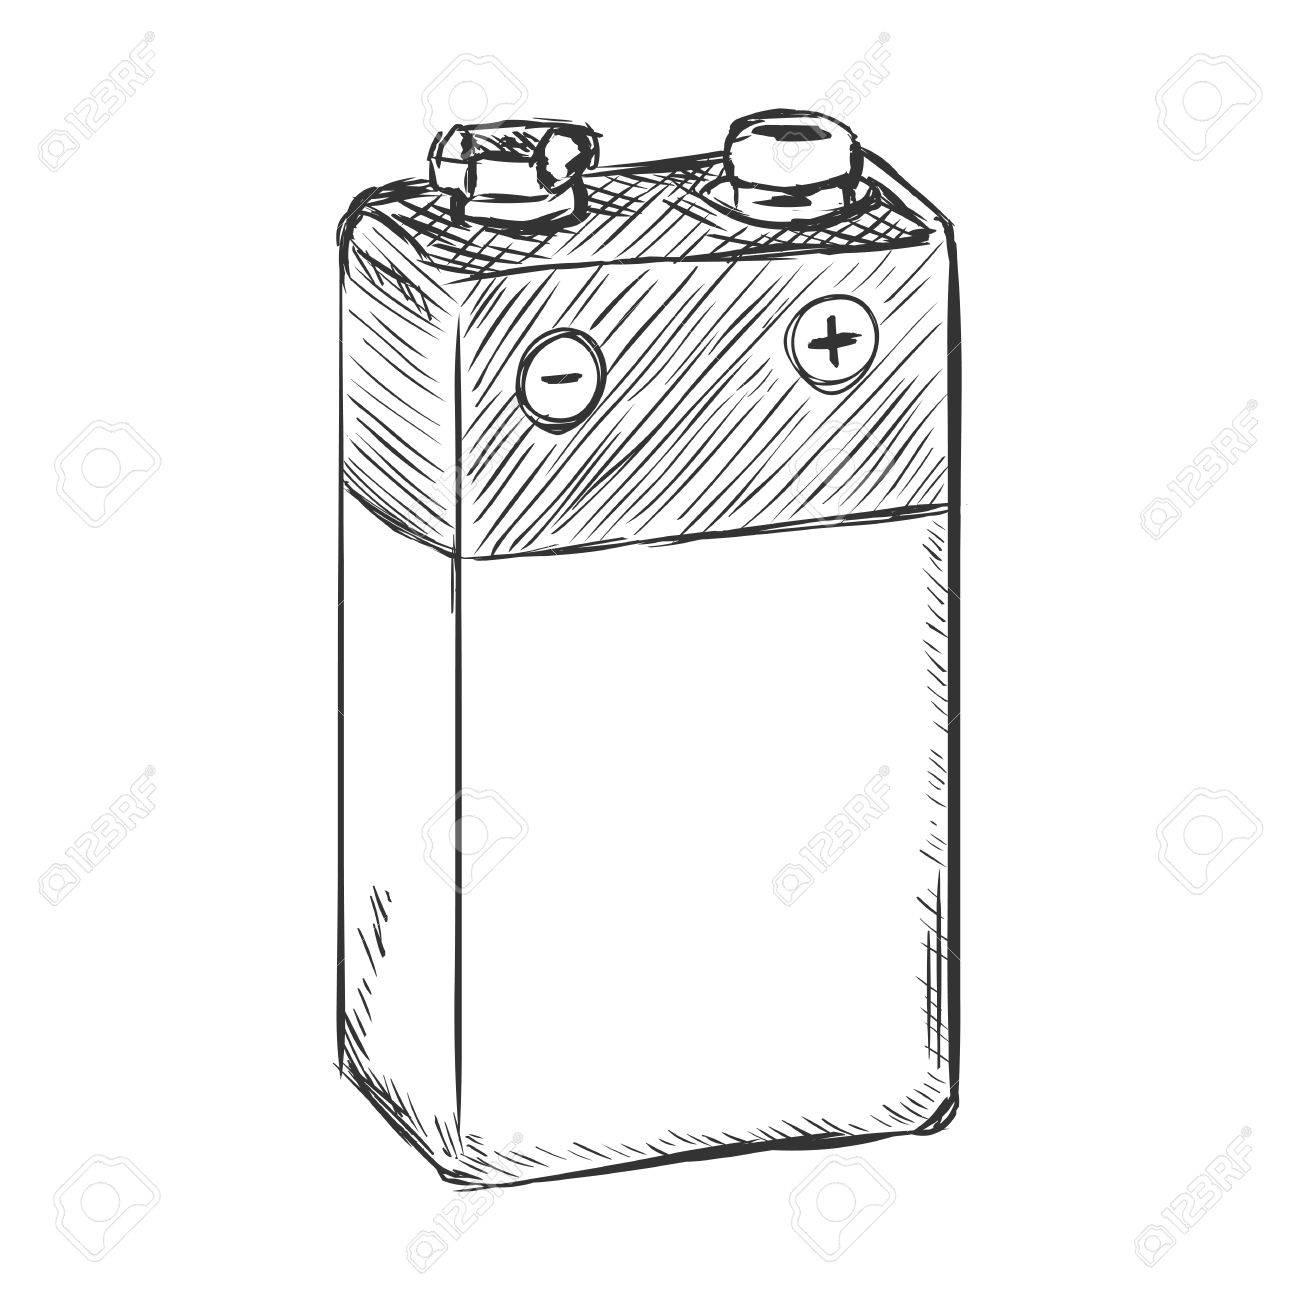 1300x1300 Vector Sketch 9v Krona Battery On White Background Royalty Free